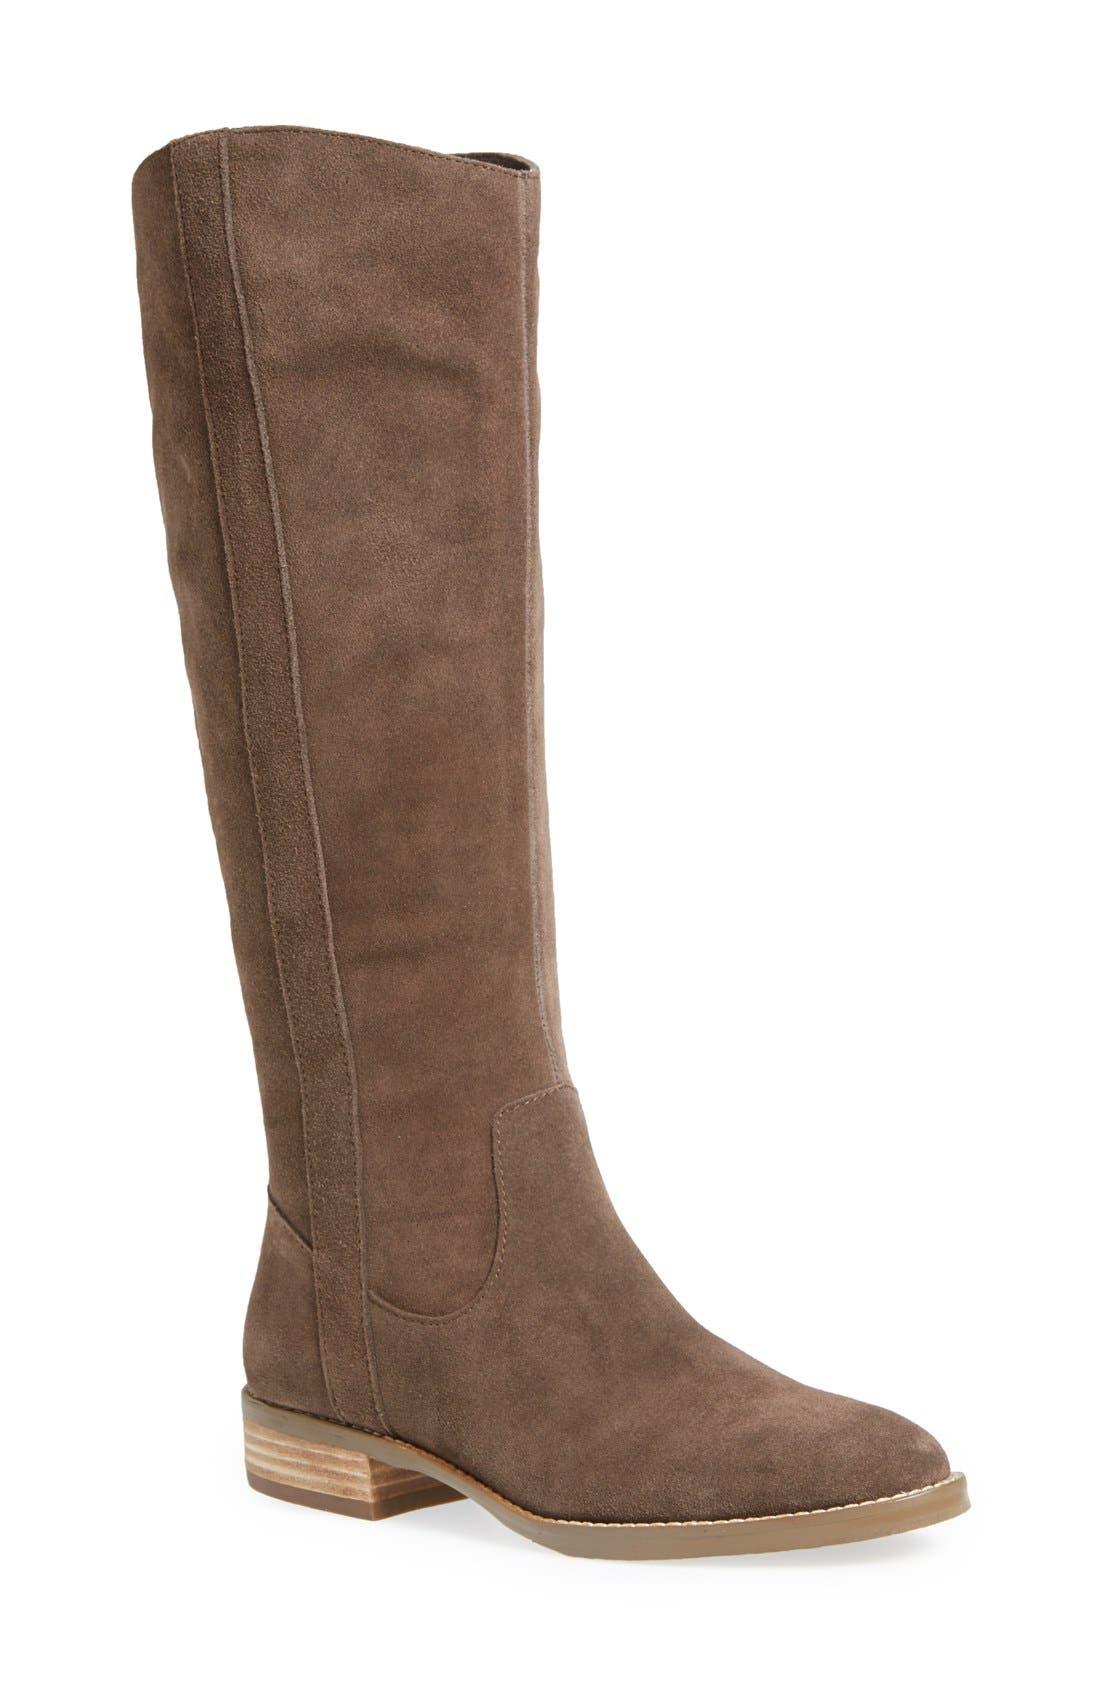 'Teba' Knee High Boot,                         Main,                         color, 021